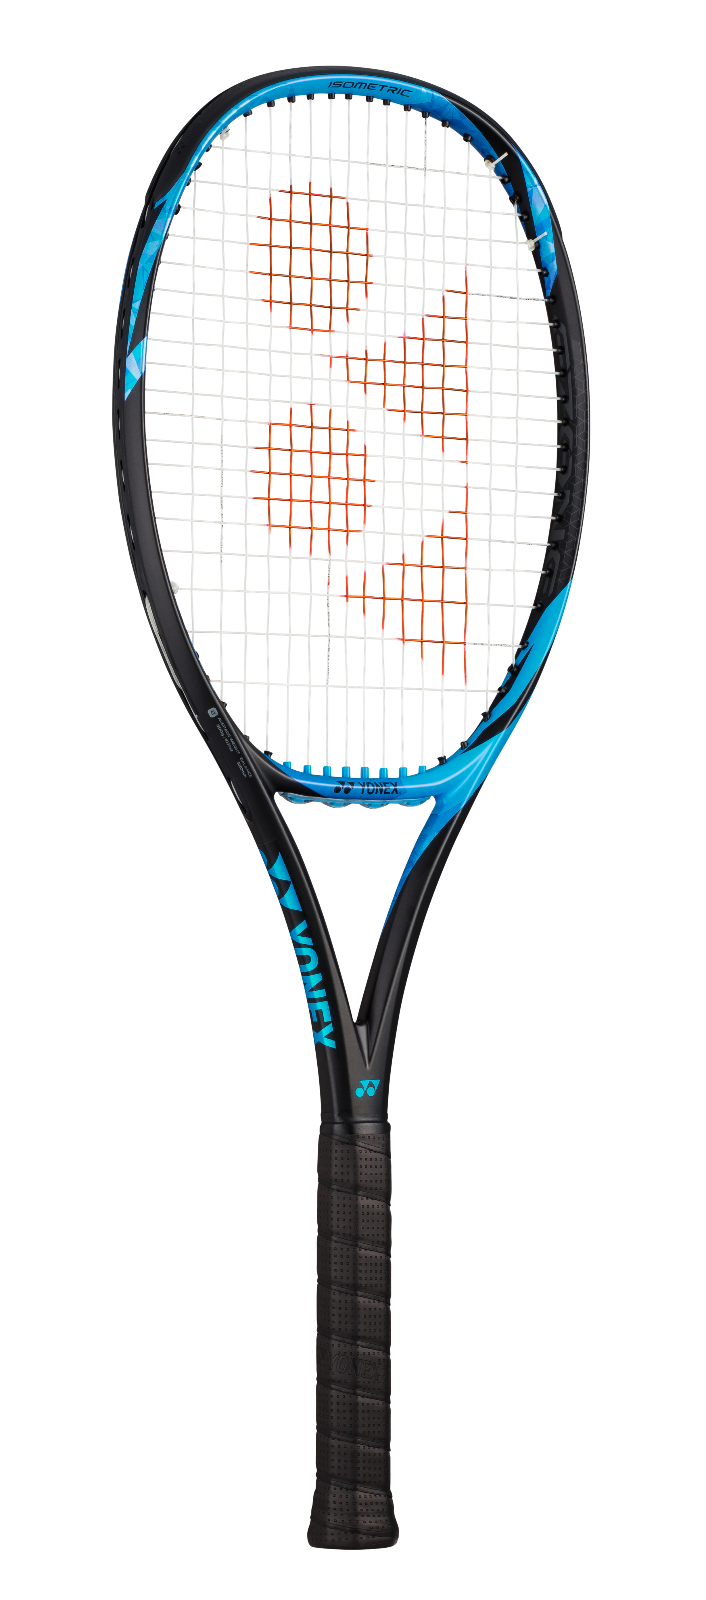 Yonex EZONE 98 305 blu 2018 manico l4 = 4 1/2 Racchette da tennis tennis racquet